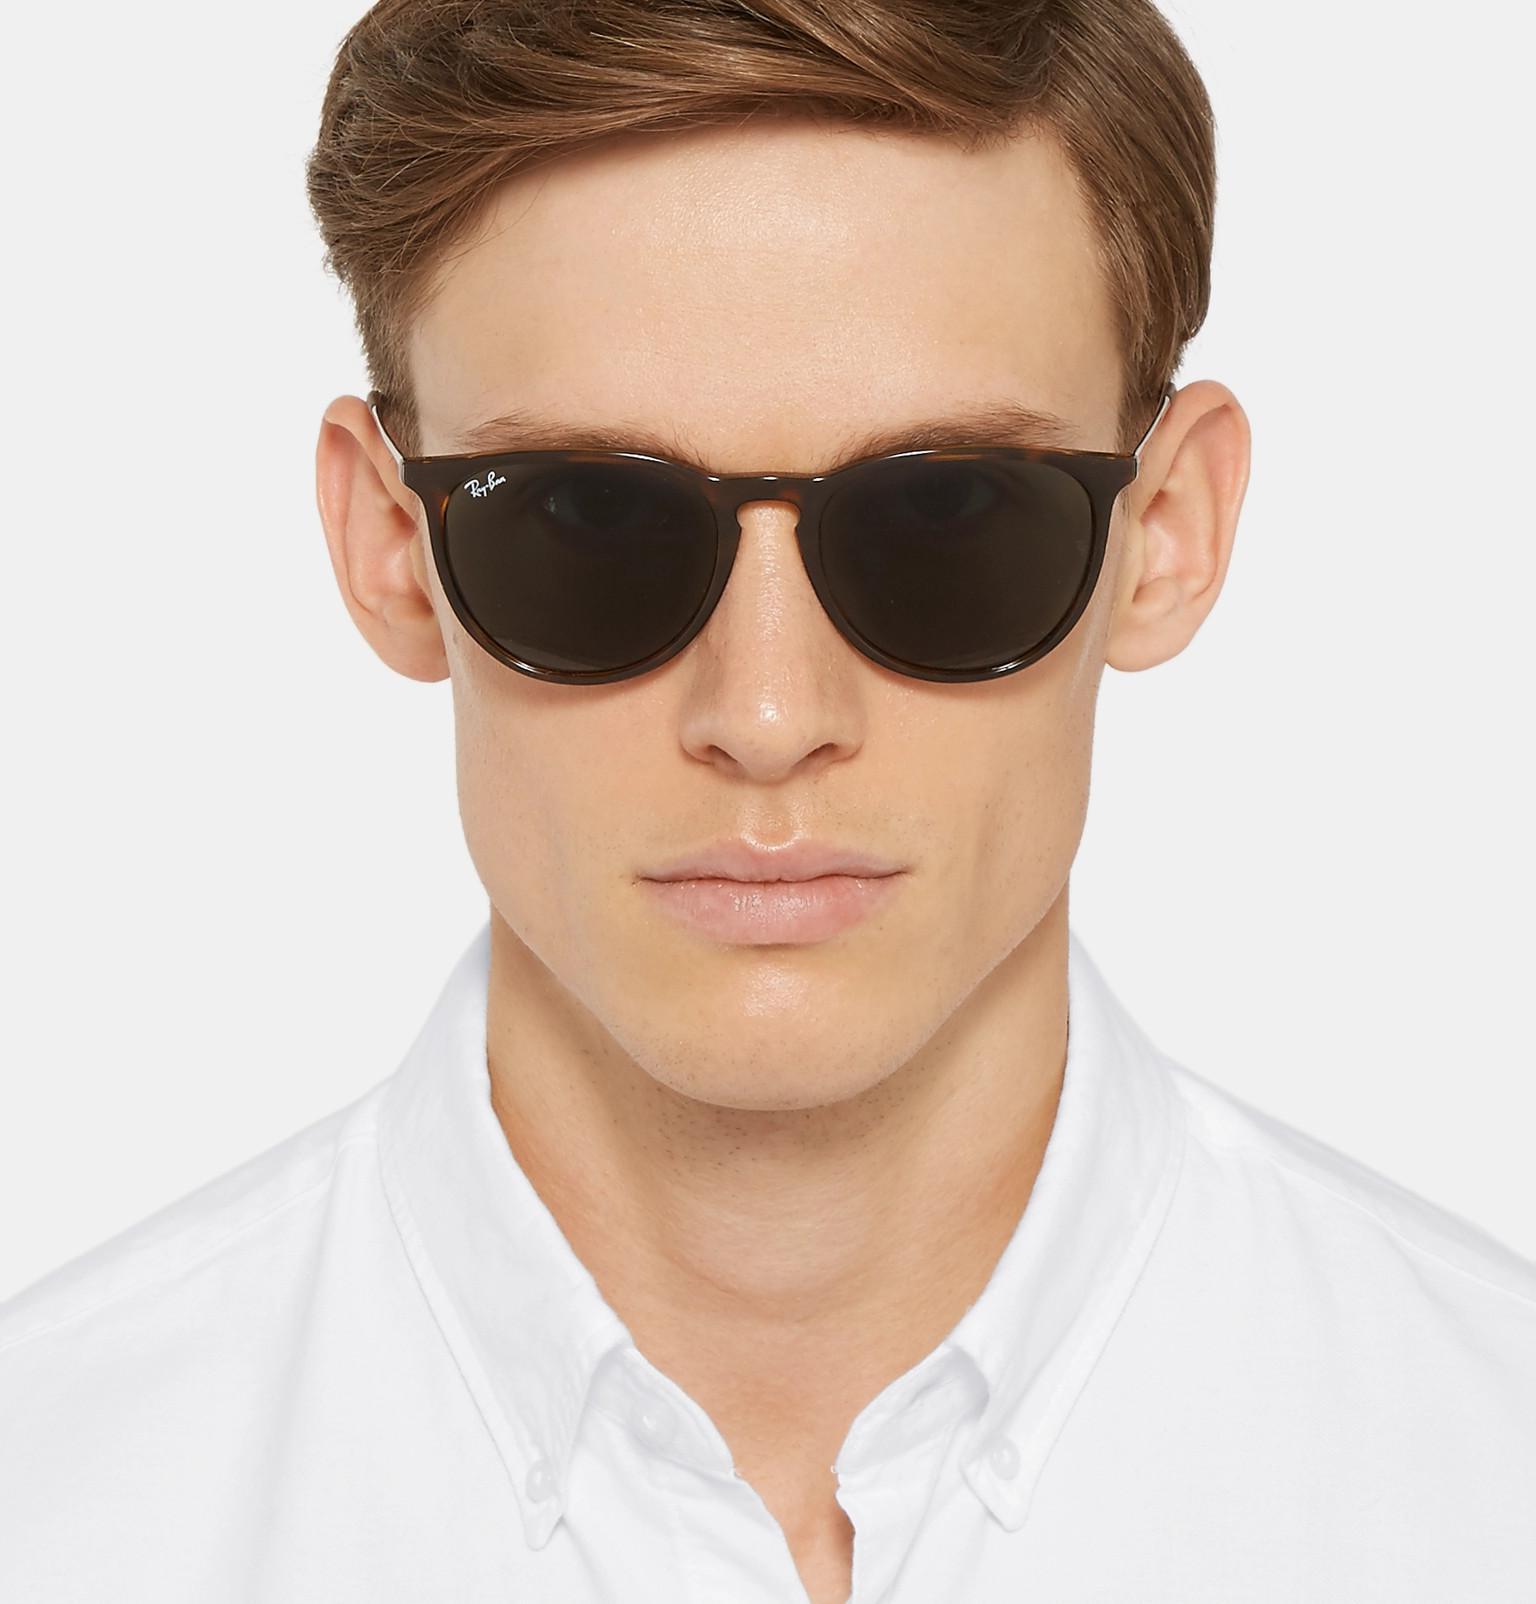 Ray-Ban Erika Round-frame Tortoiseshell Acetate Sunglasses in Brown ... 0c417abe362